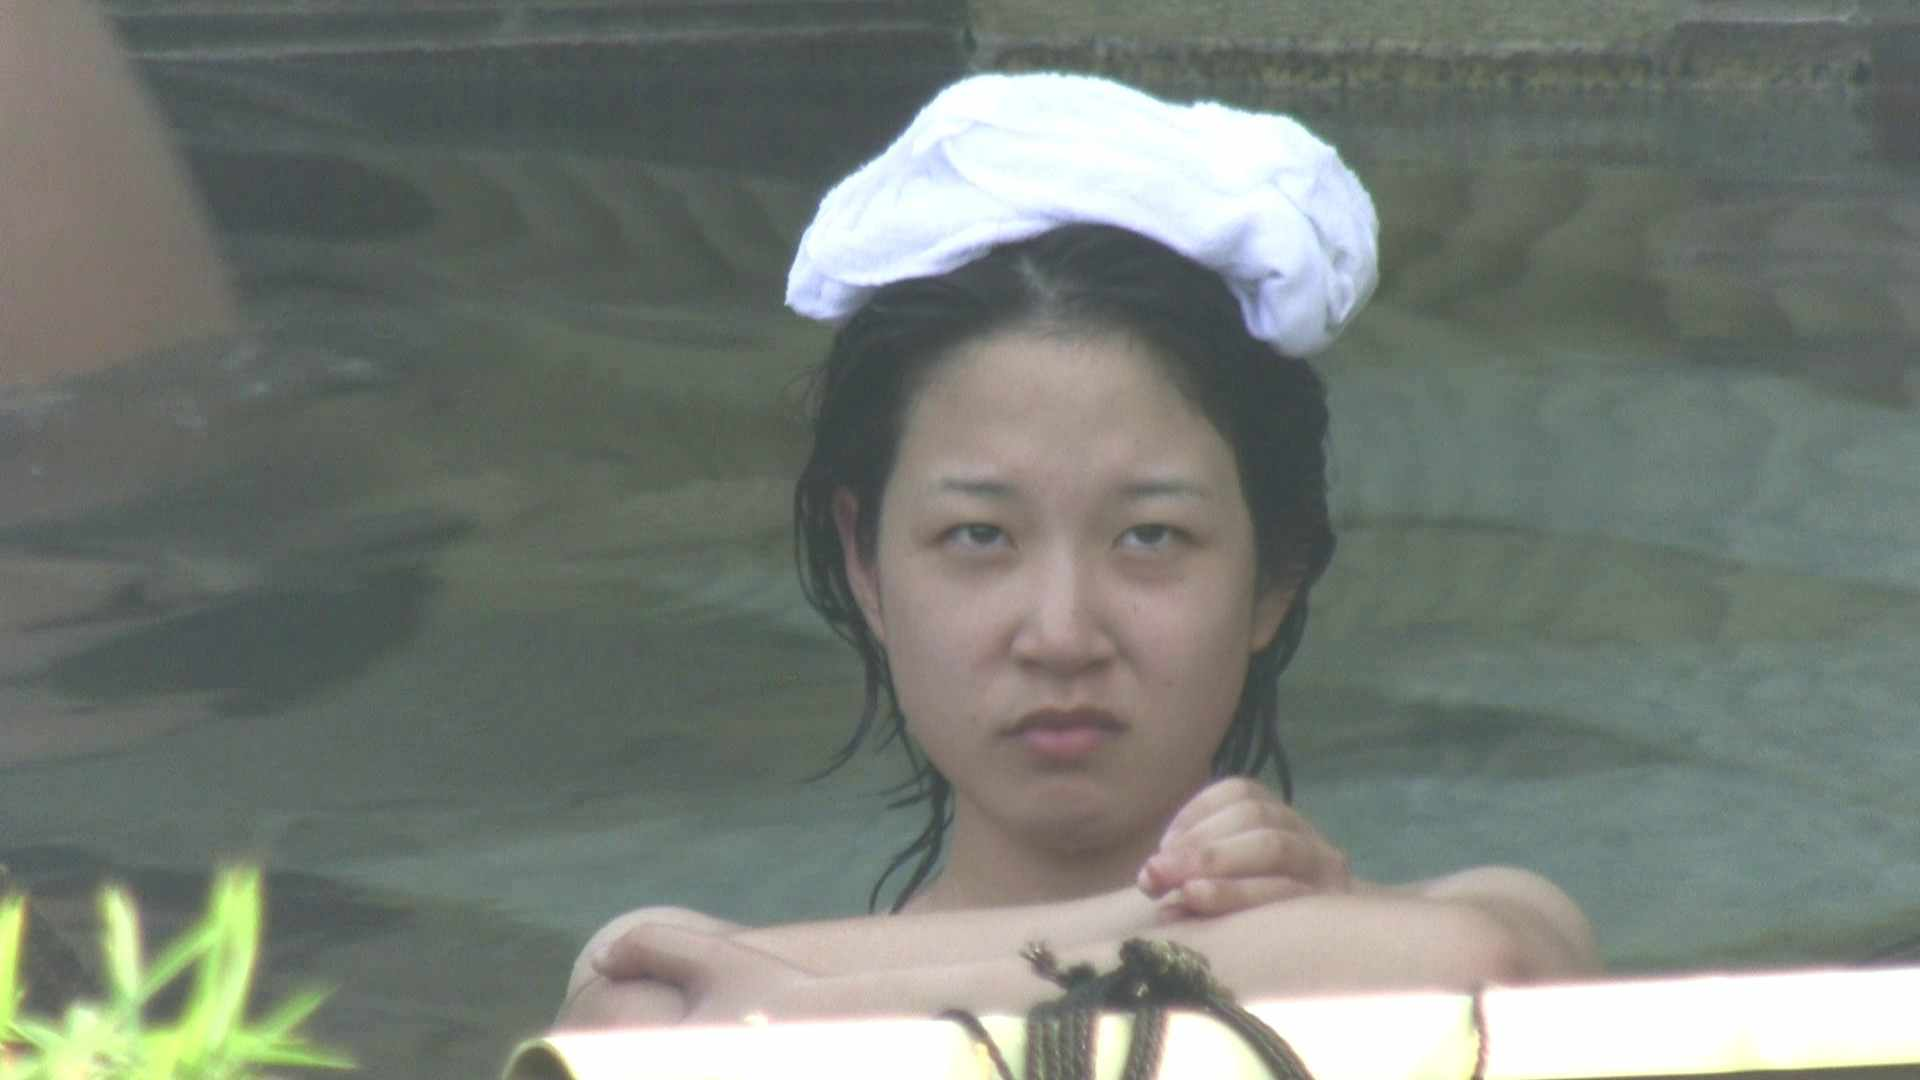 Aquaな露天風呂Vol.172 盗撮映像  113Pix 70